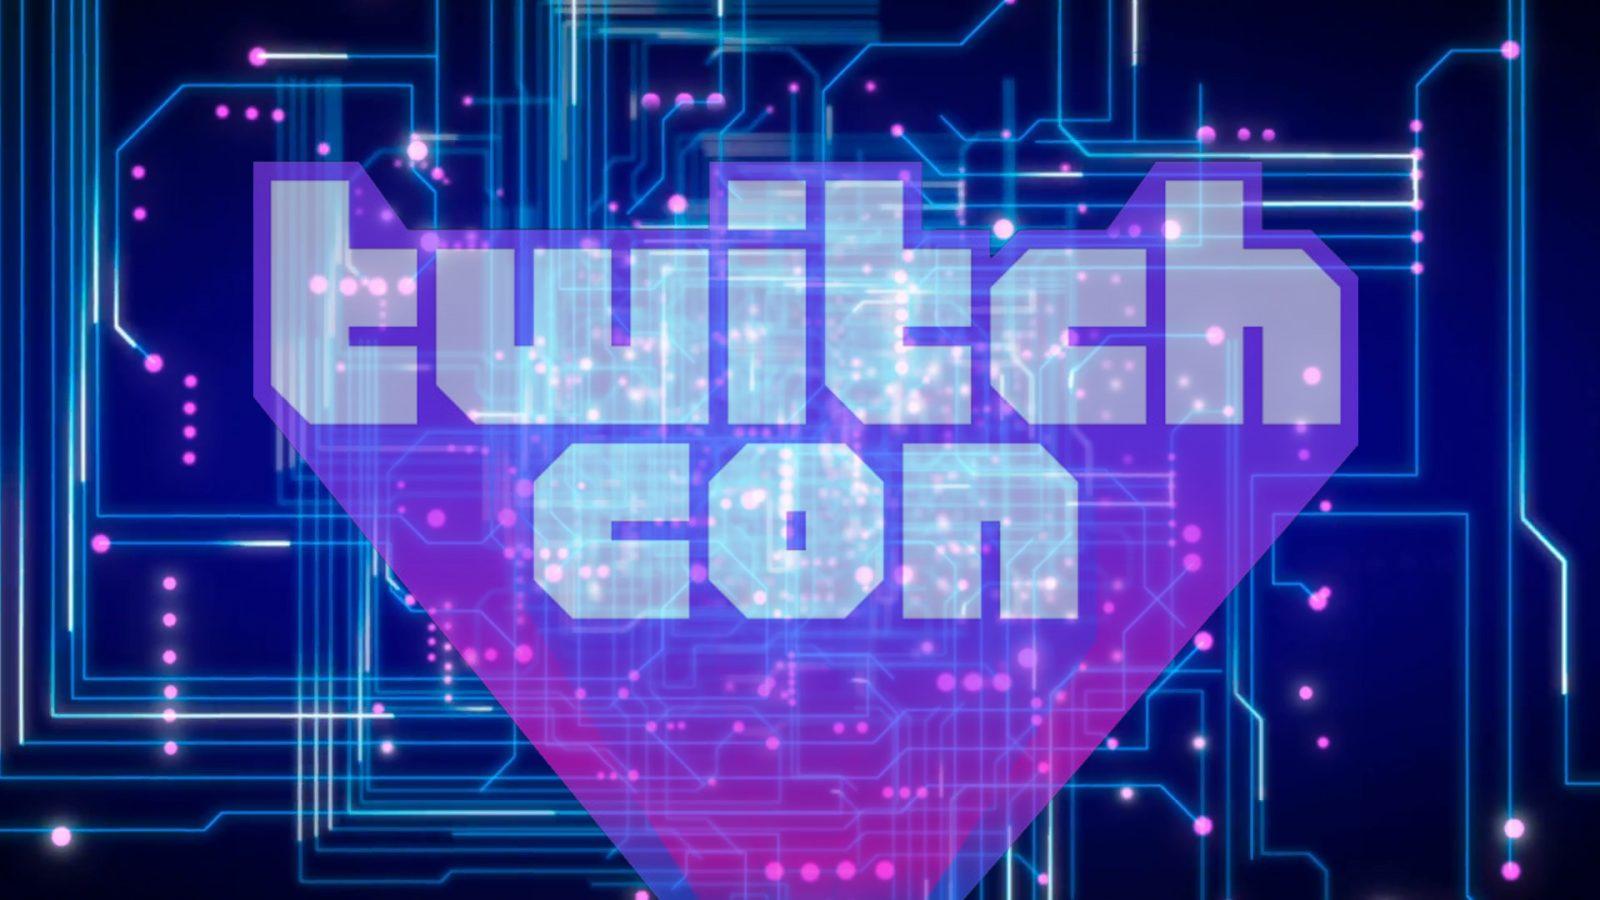 Digital Twitchcon